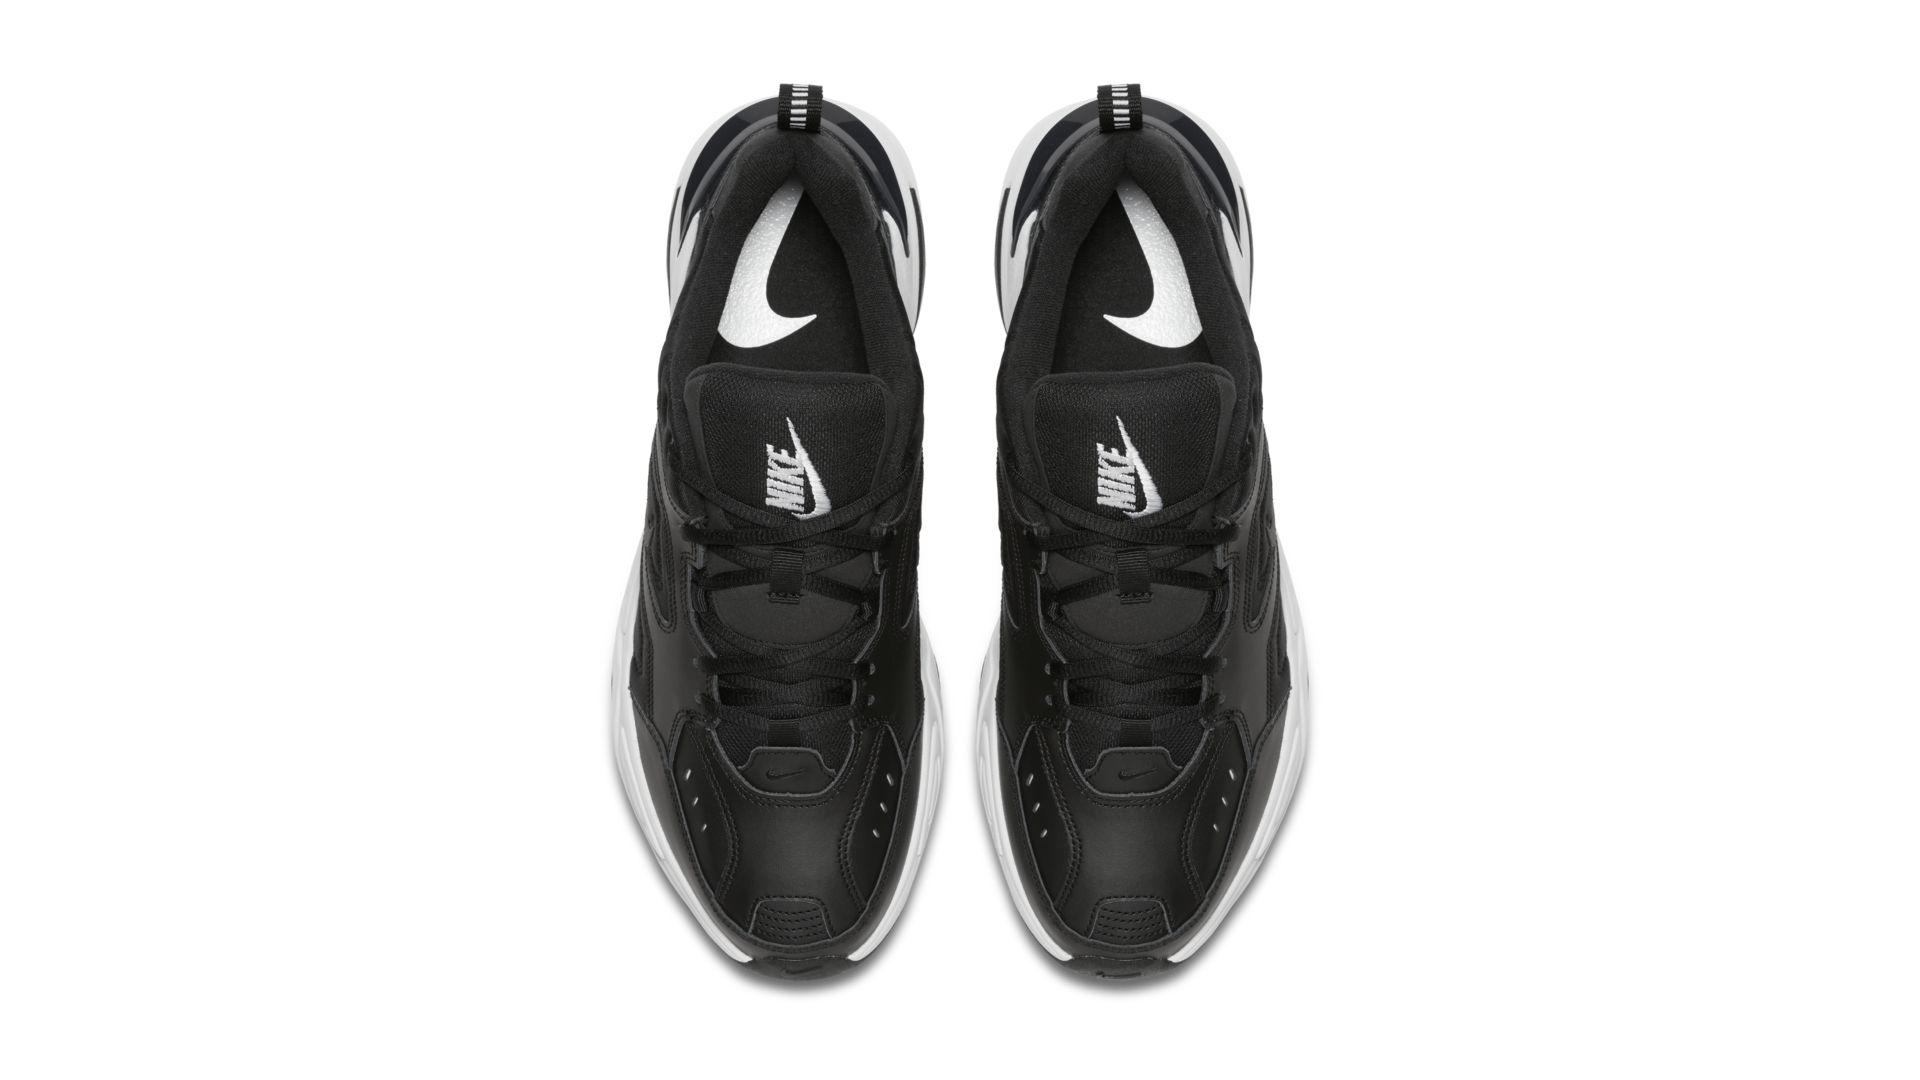 Nike M2k Tekno BlackBlack Off White Obsidian (AV4789 002